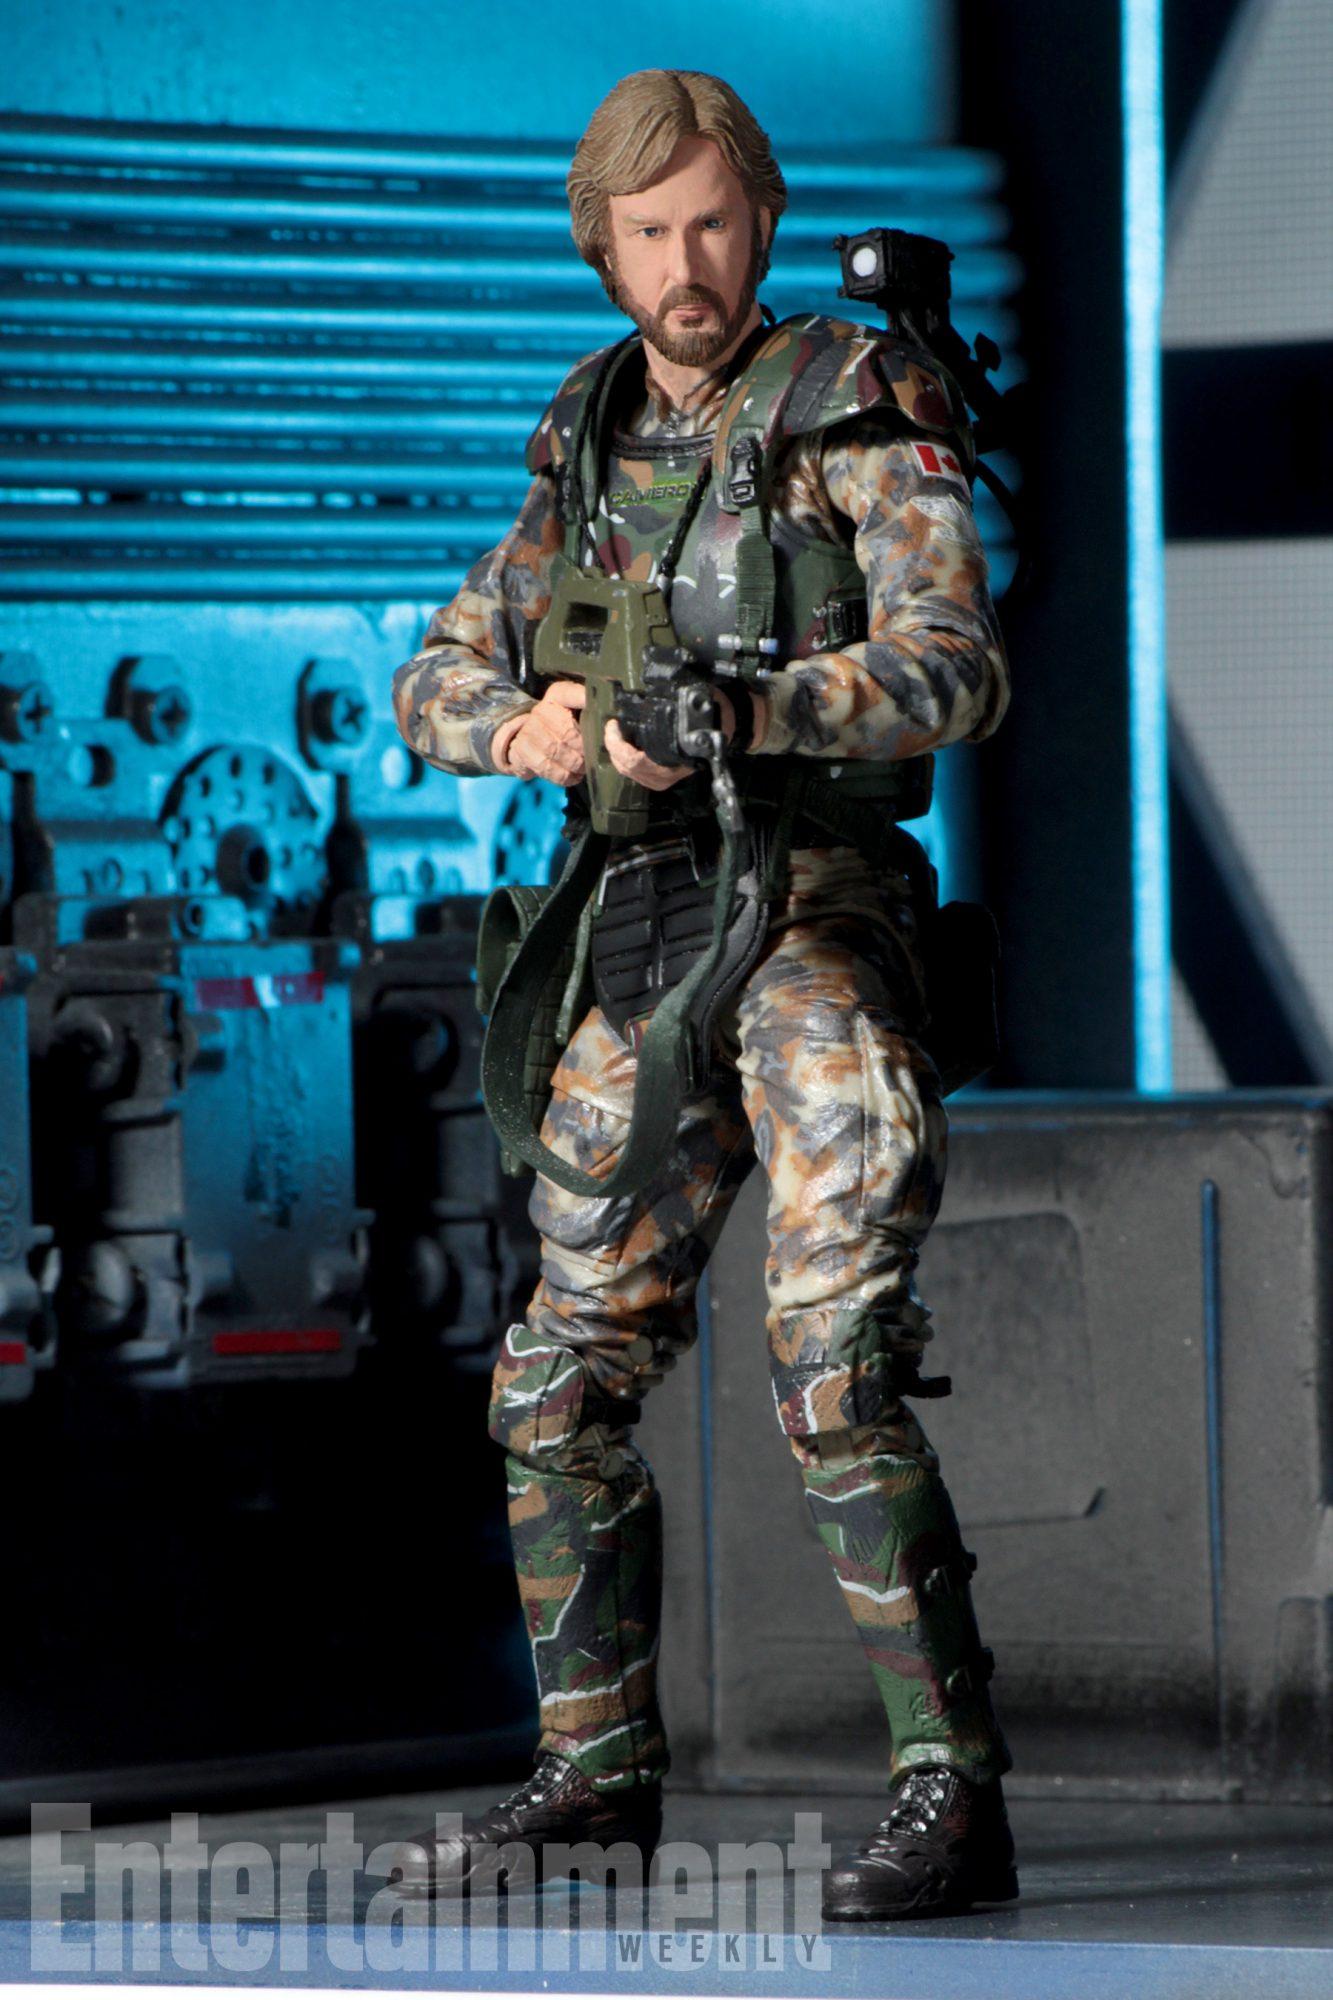 James Cameron action figure